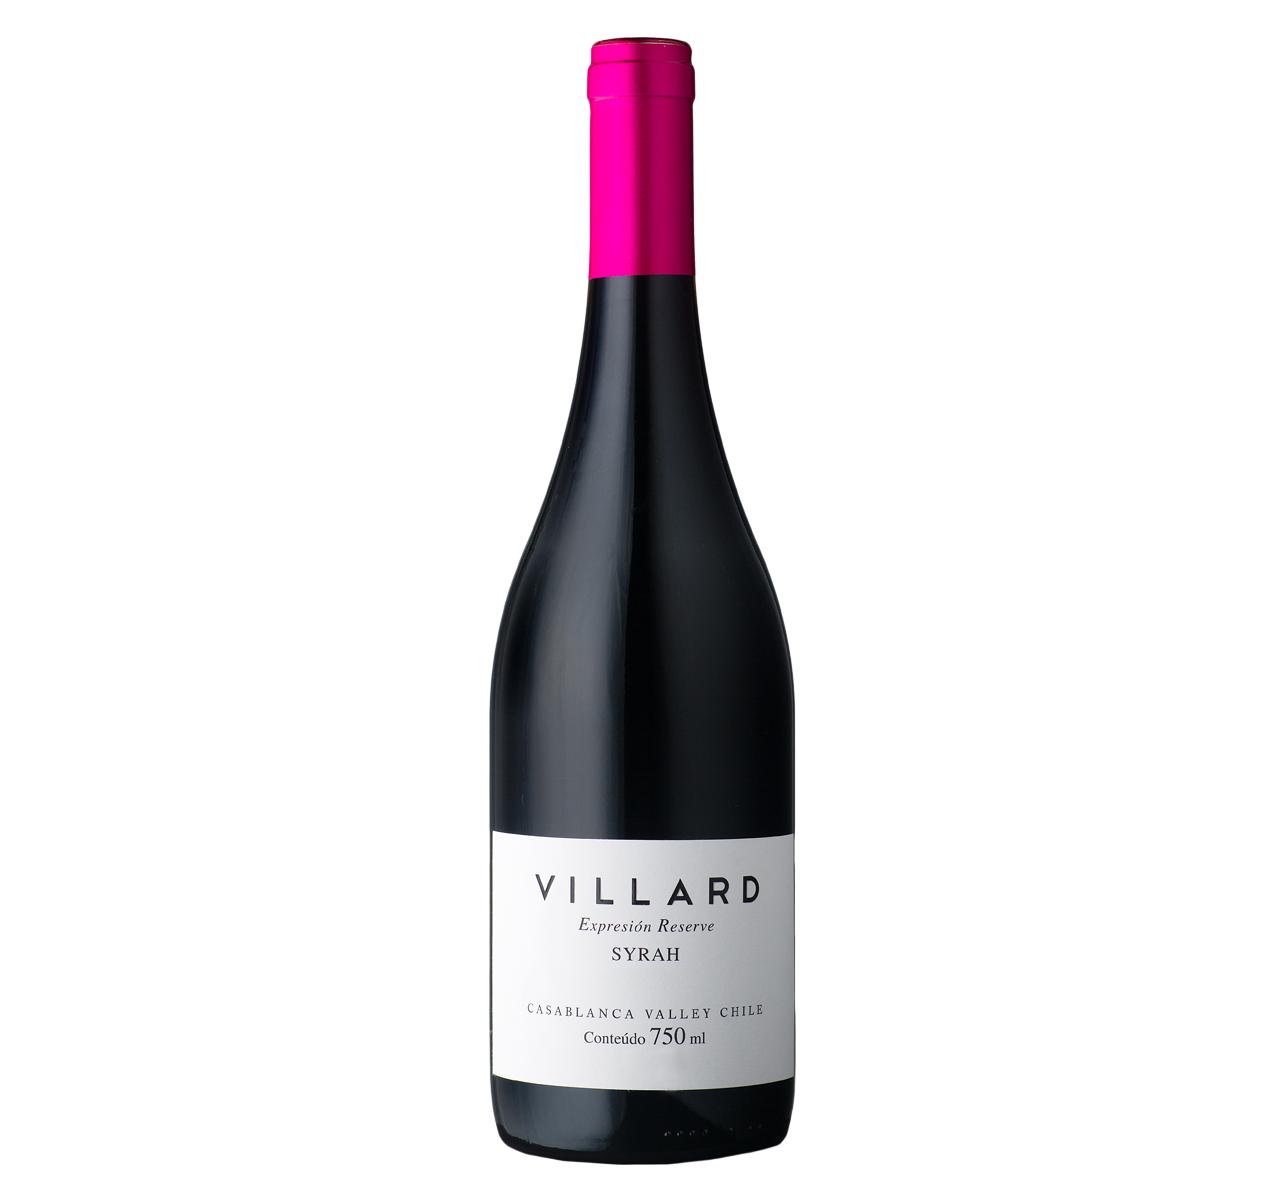 Villard Expression Reserve Syrah